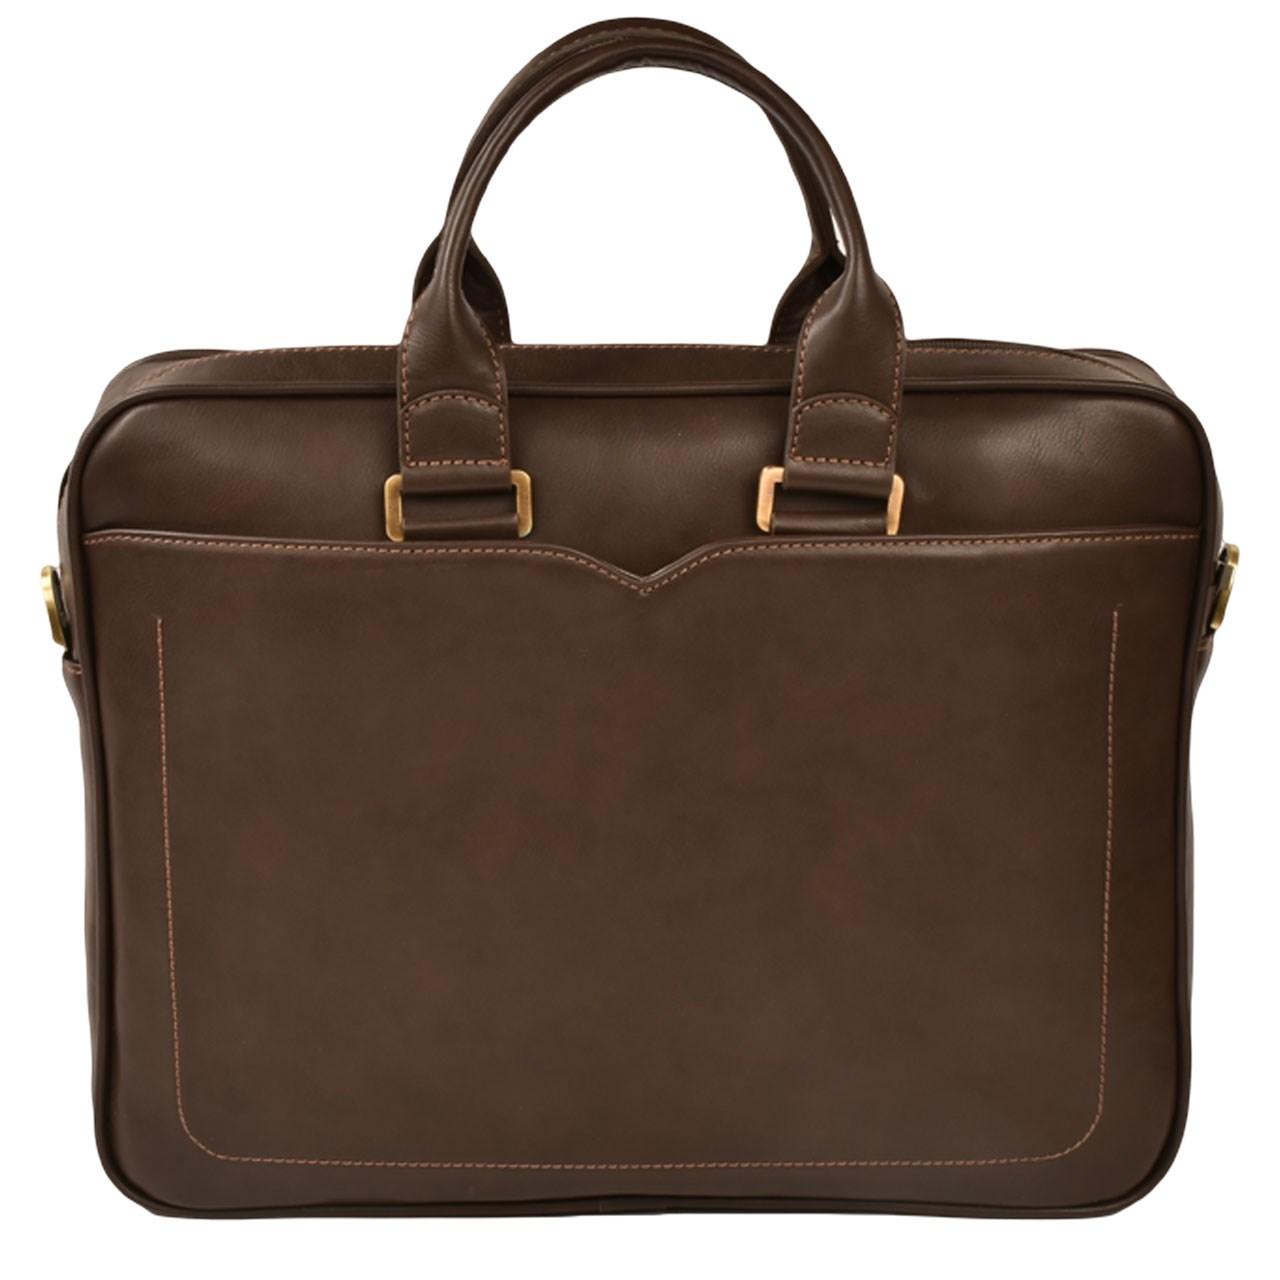 کیف اداری چرم مصنوعی پارینه چرم مدل P157-7